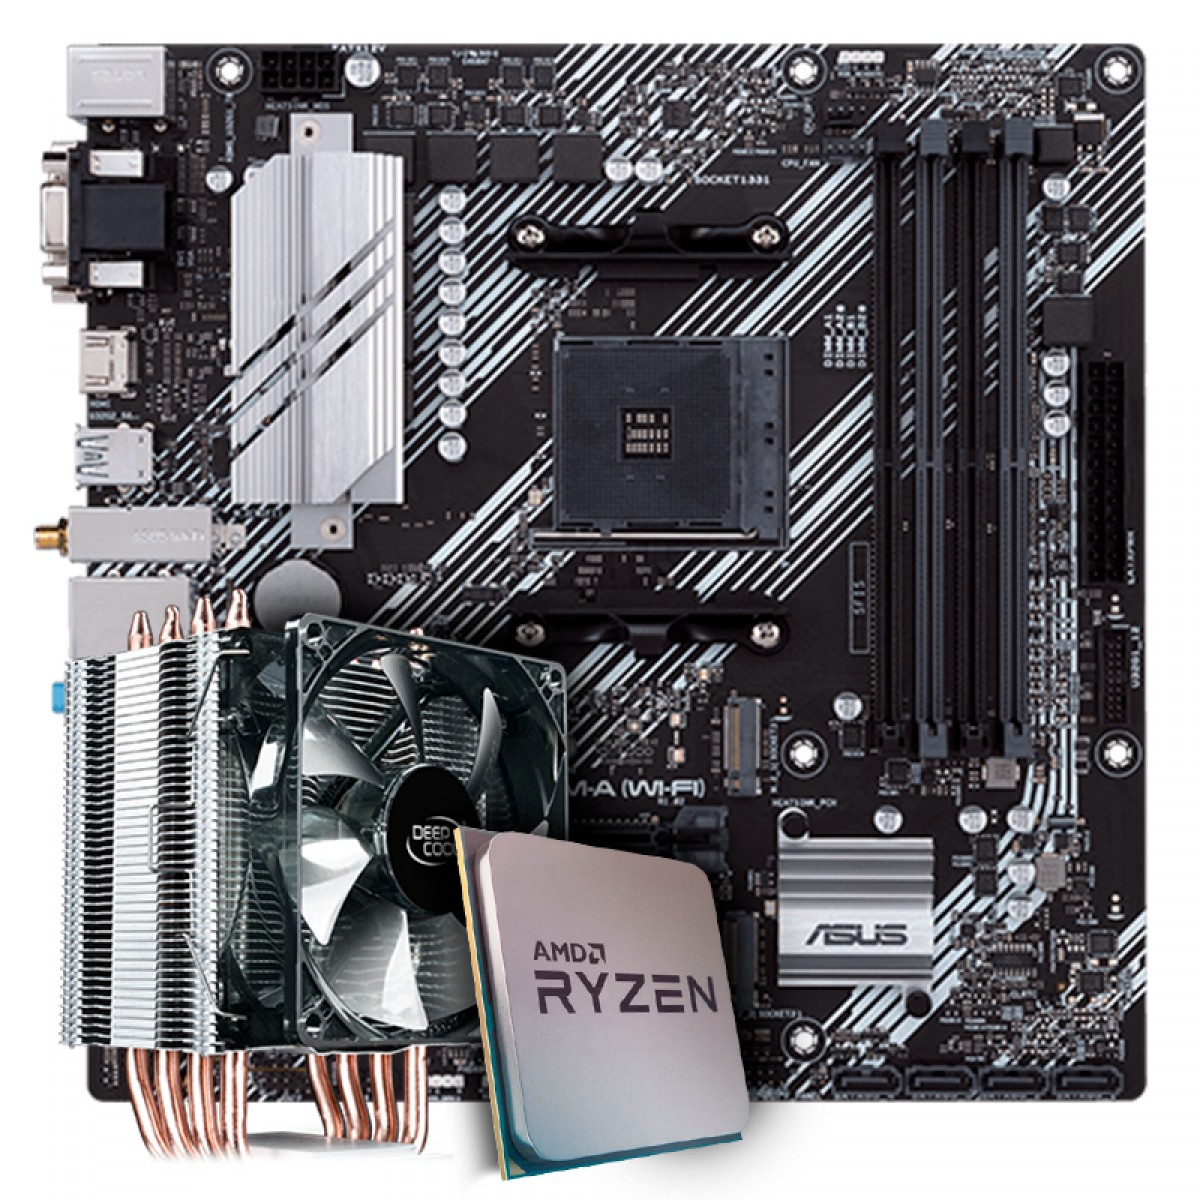 Kit Upgrade, AMD Ryzen 9 3900X, Asus Prime B550M-A Wi-fi, Cooler Deepcool Gammaxx